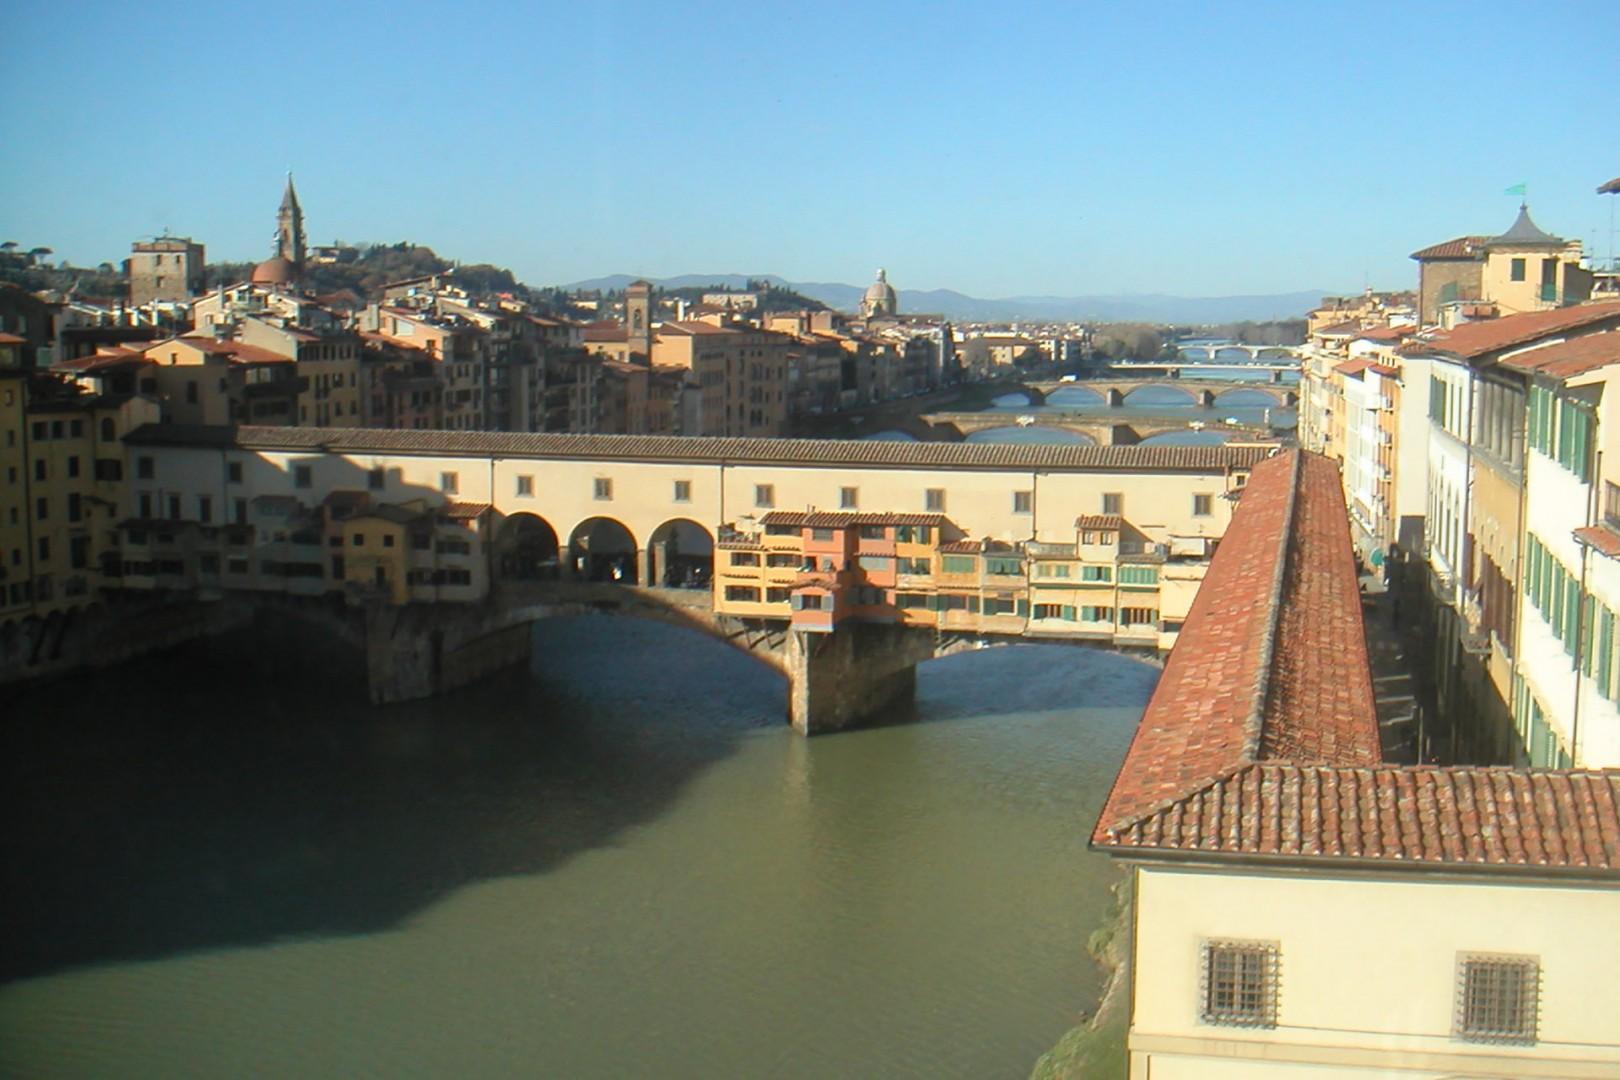 Another view of the picturesque Ponte Vecchio bridge near the Casetta.